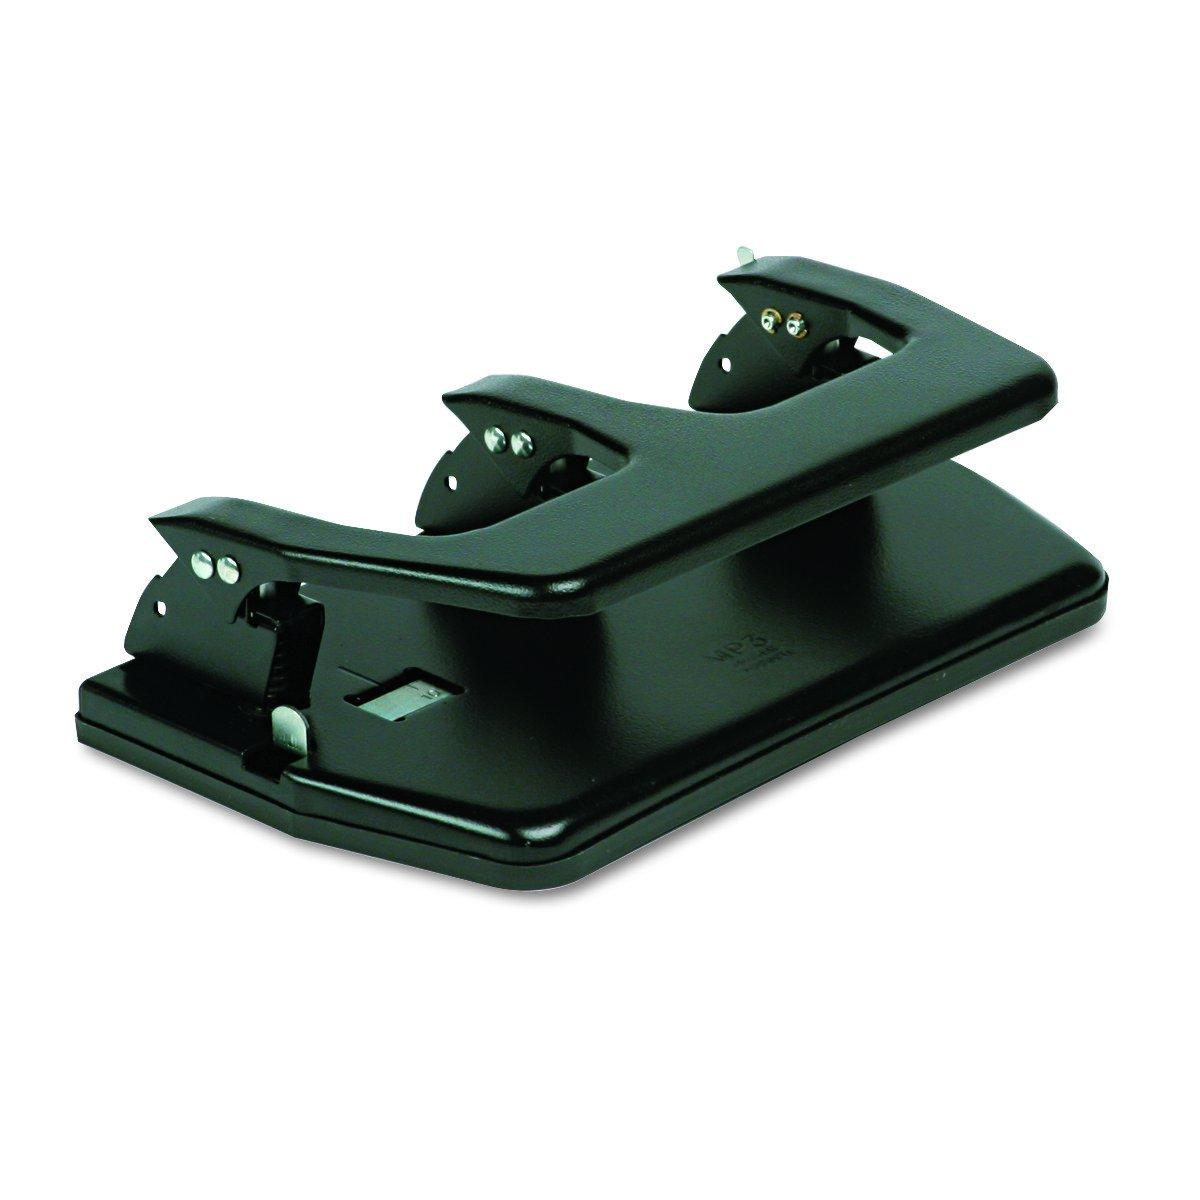 Master MP3 20-Sheet Three-Hole Punch, Oversized Handle, 9/32'' Holes, Steel, Black